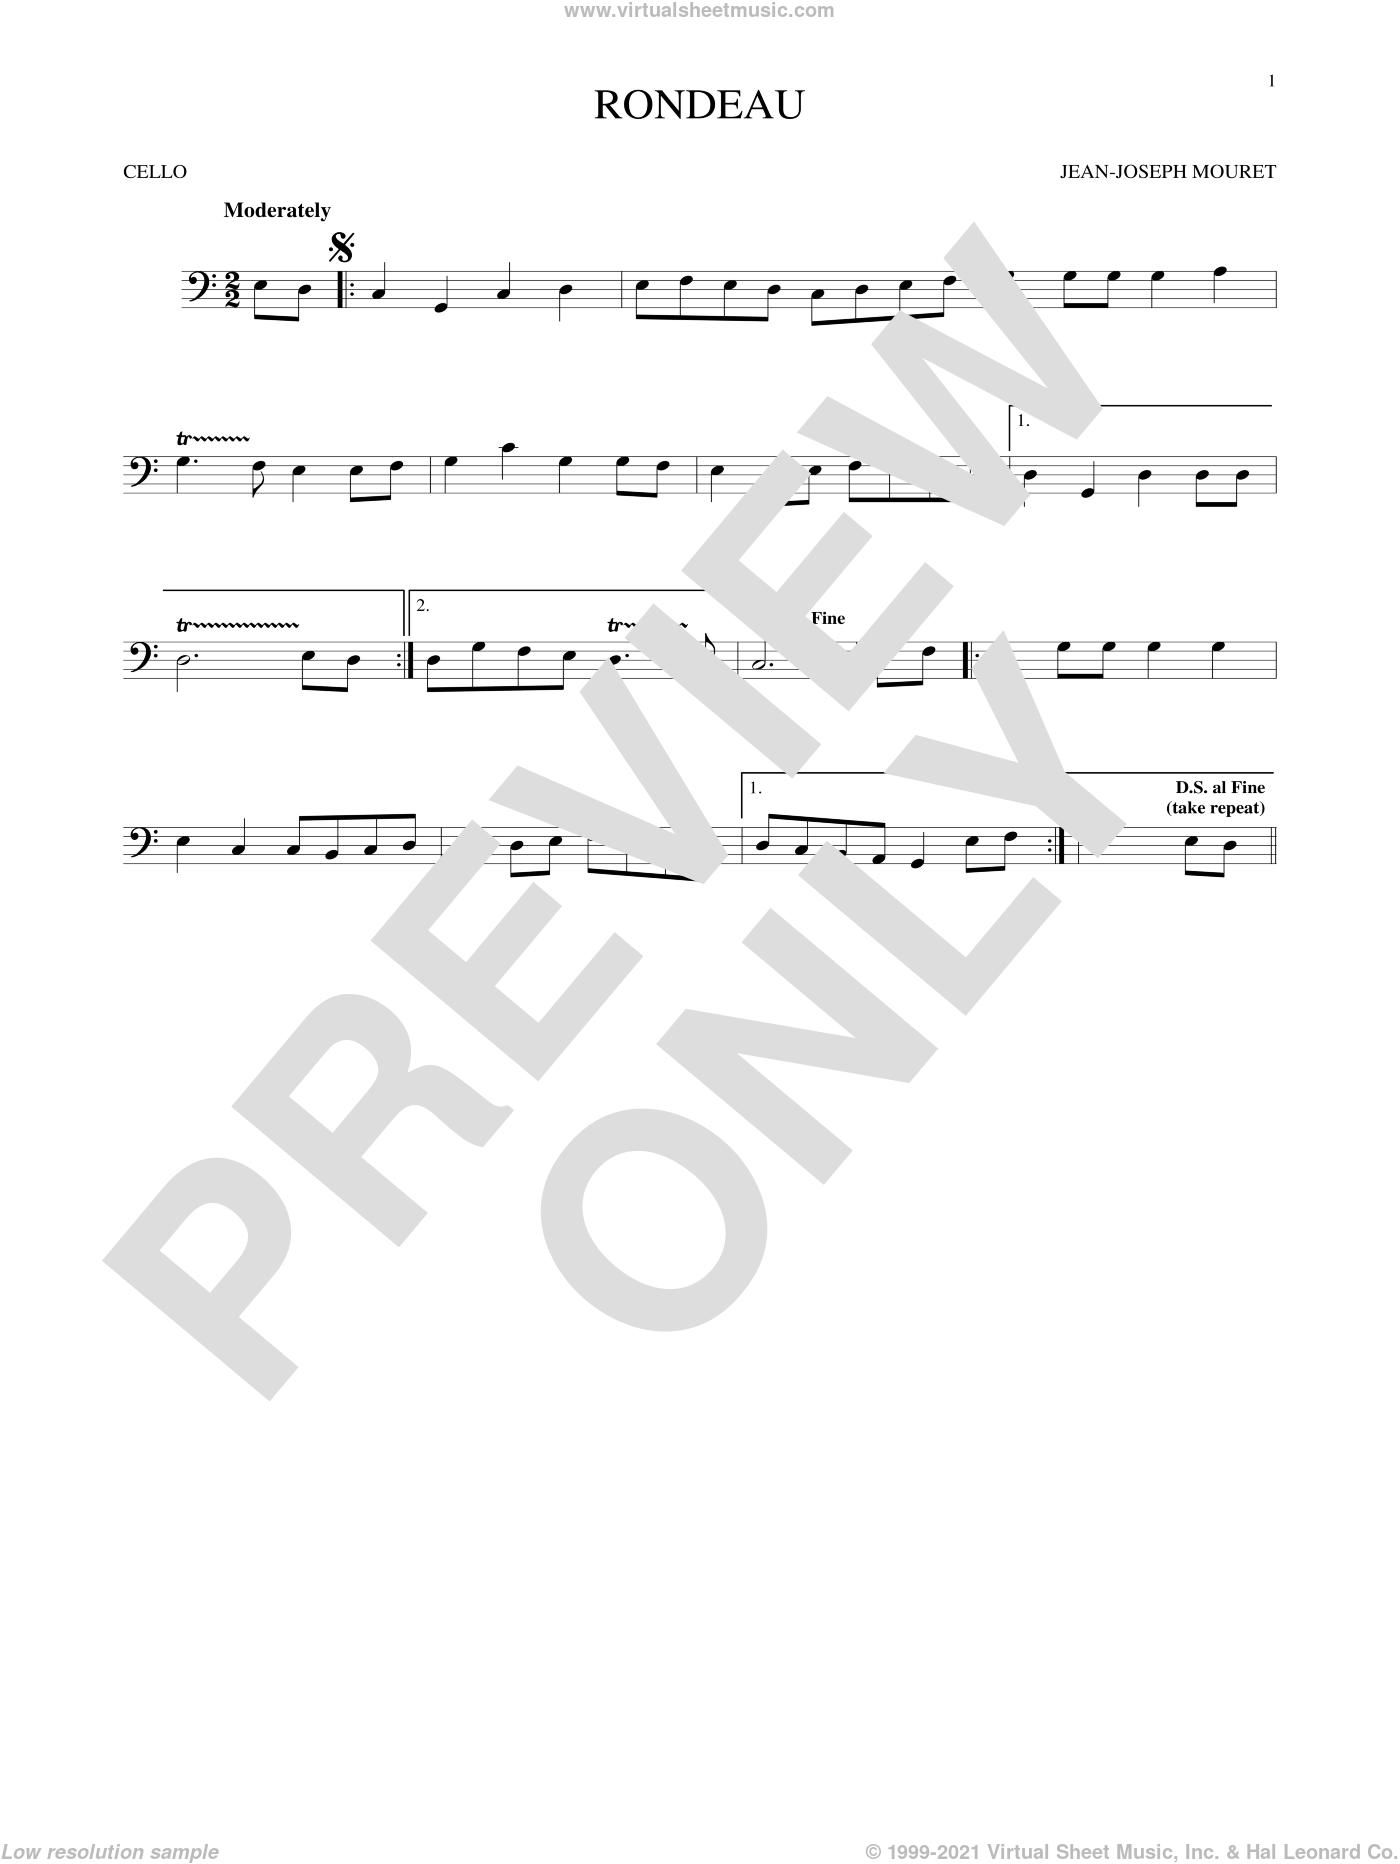 Fanfare Rondeau sheet music for cello solo by Jean-Joseph Mouret, classical score, intermediate skill level